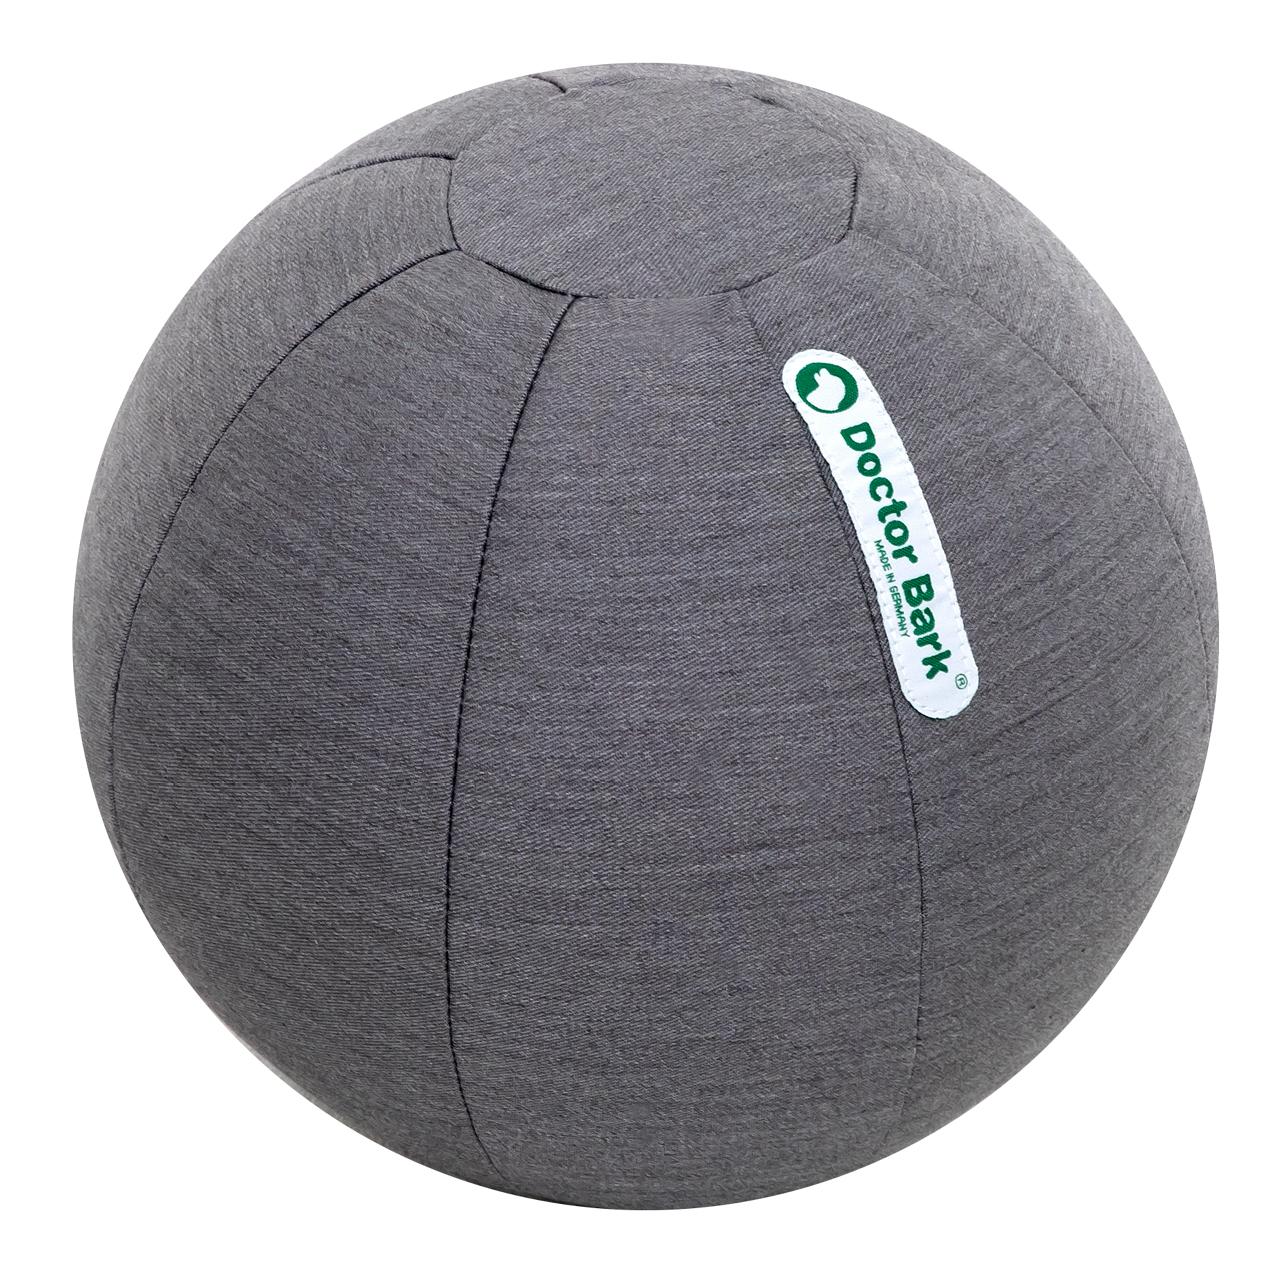 Toy Ball L grau